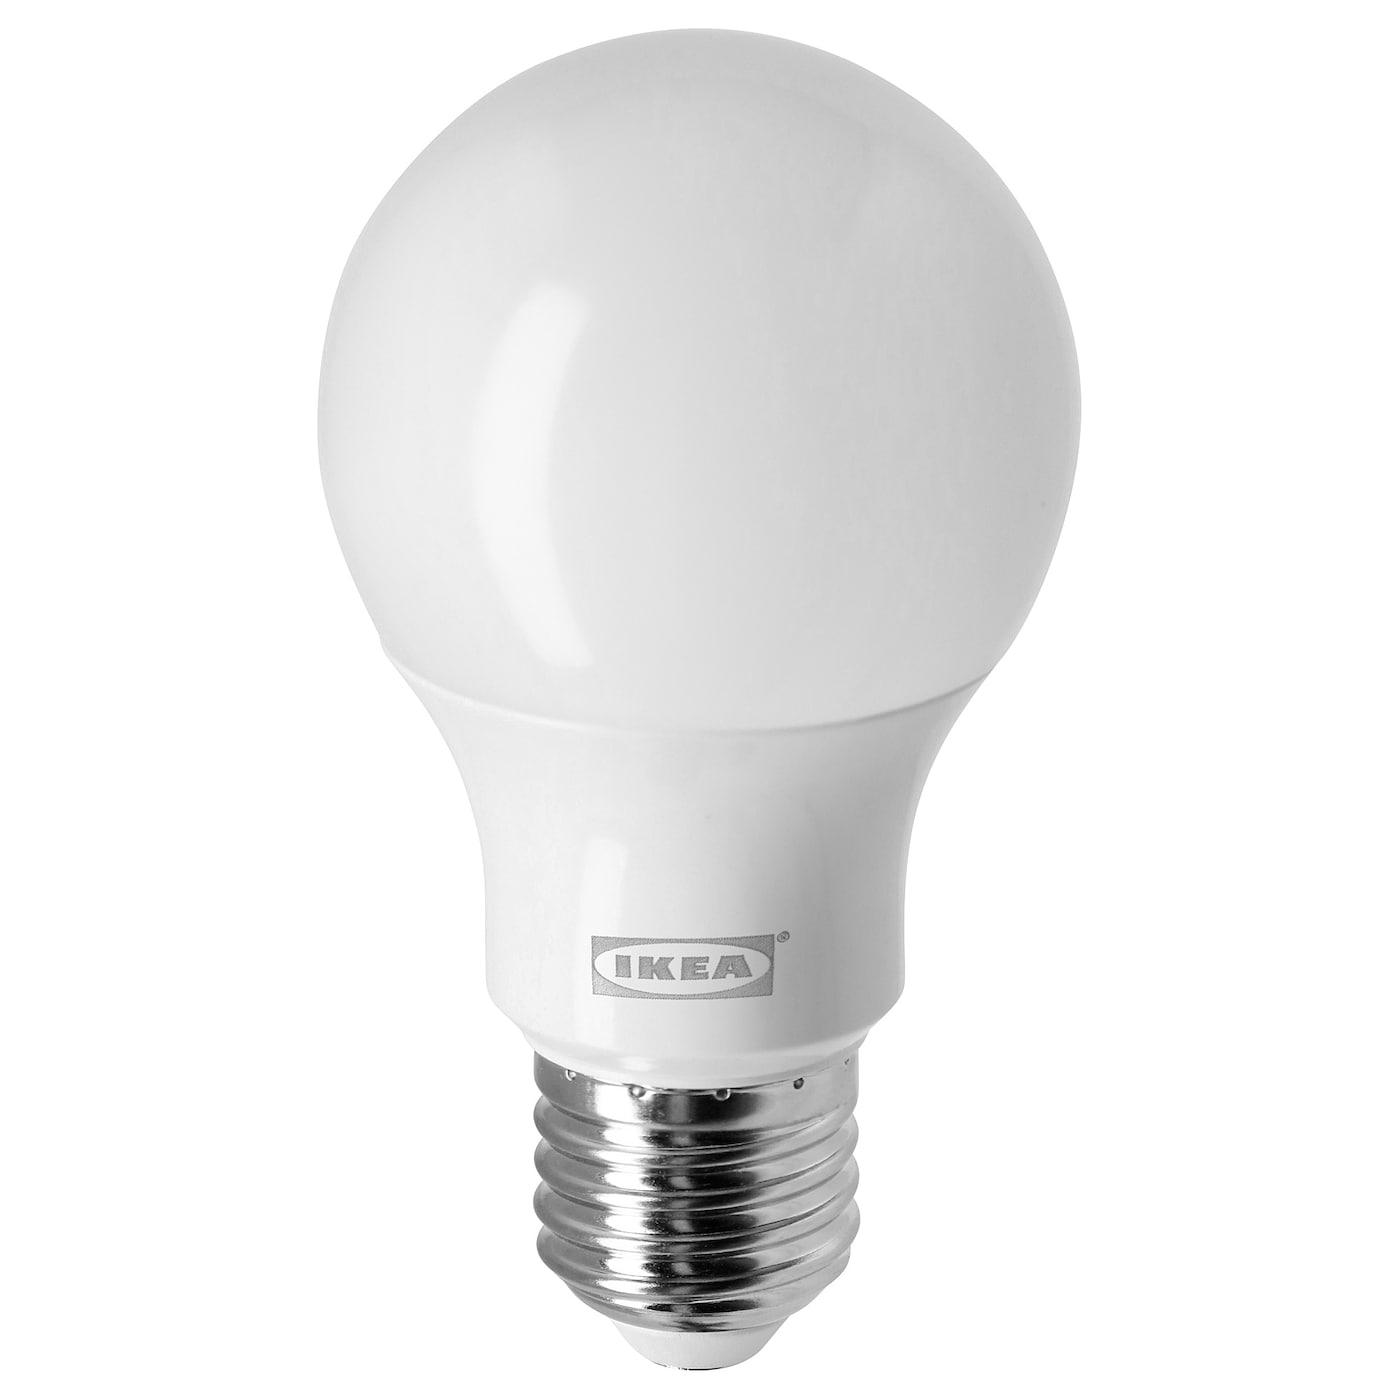 RYET Led-lamp E27 470 lumen, globe opaalwit